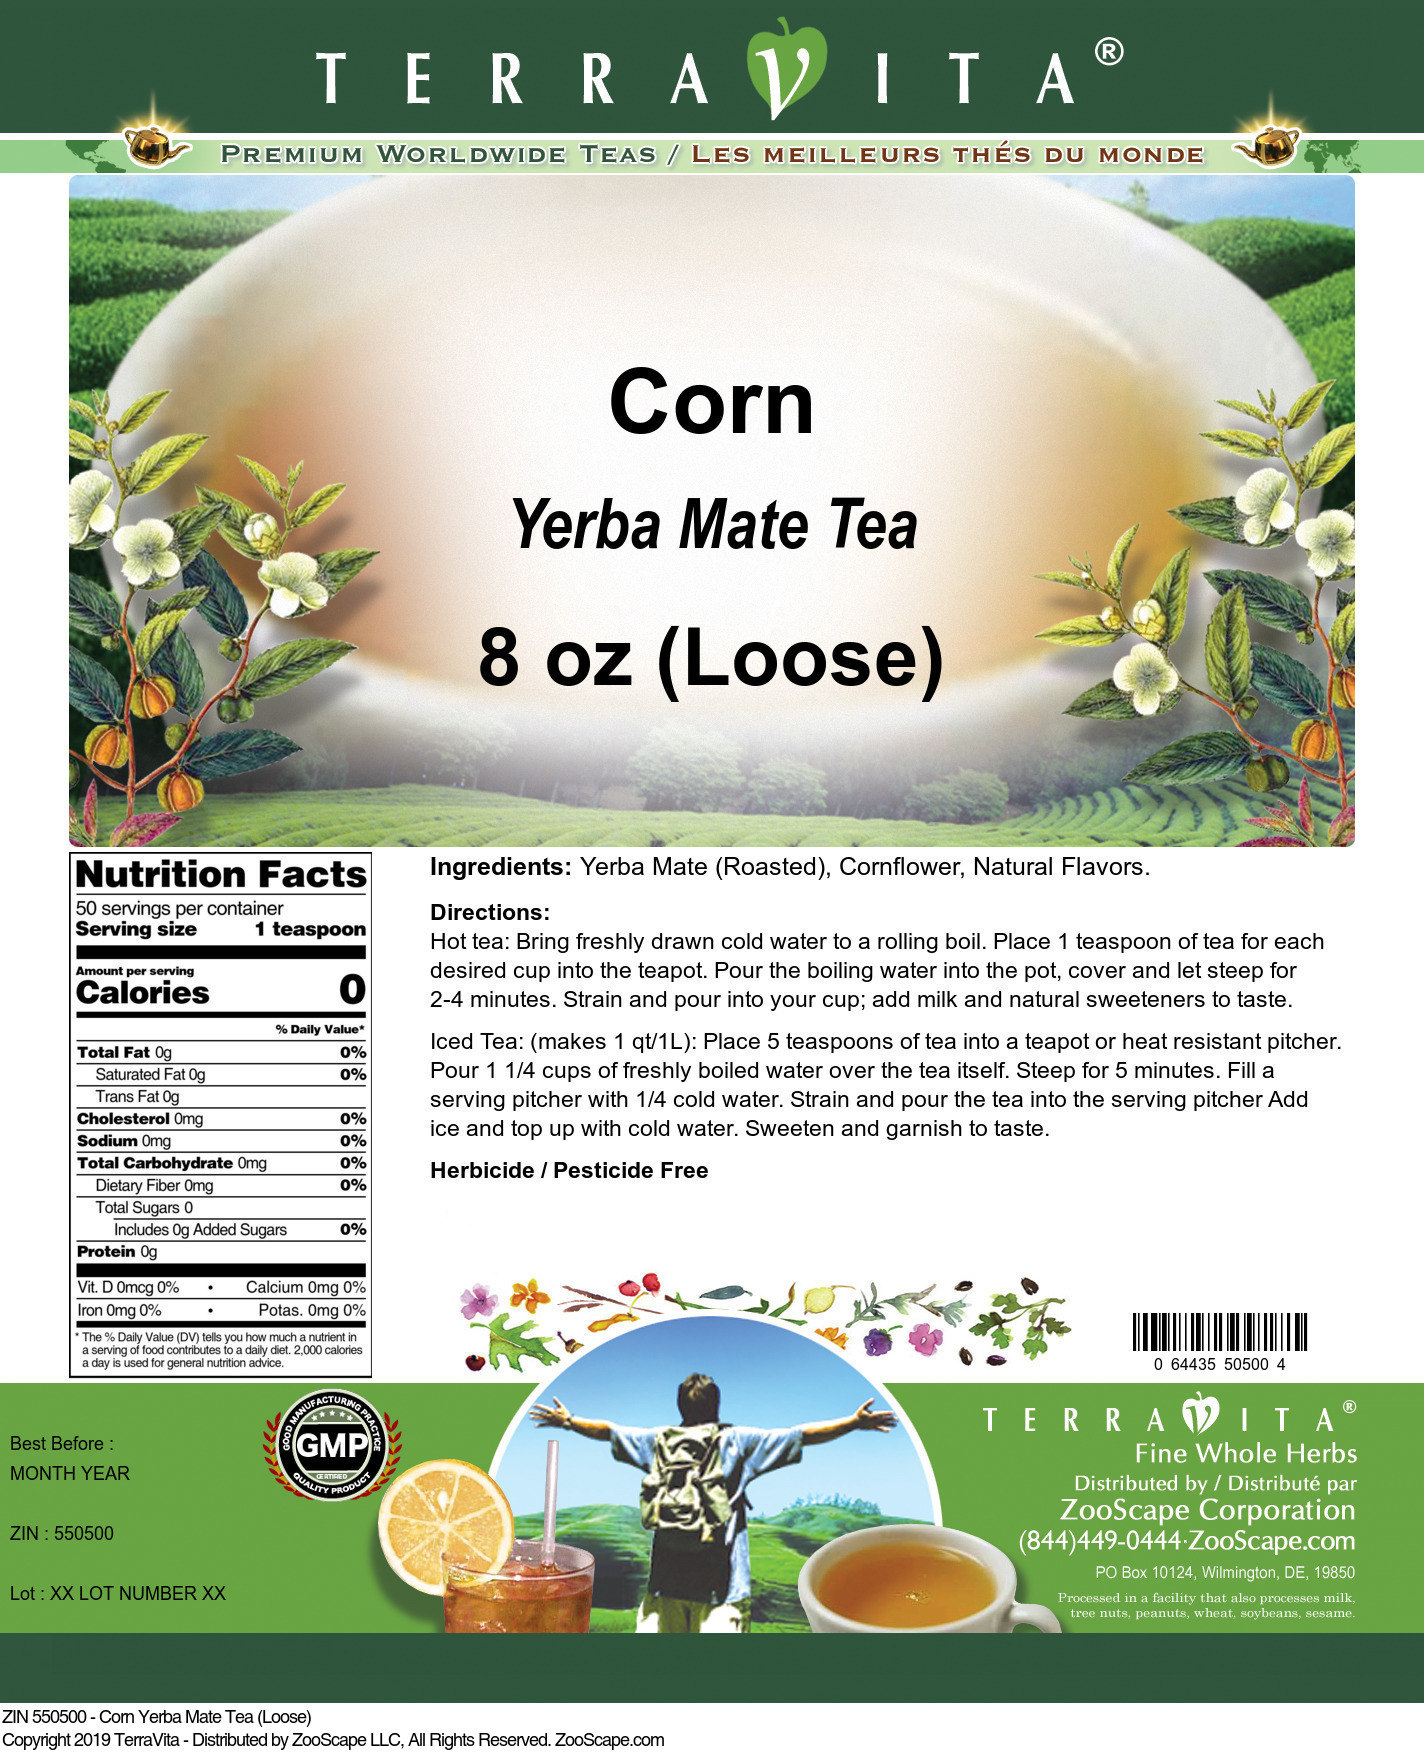 Corn Yerba Mate Tea (Loose)